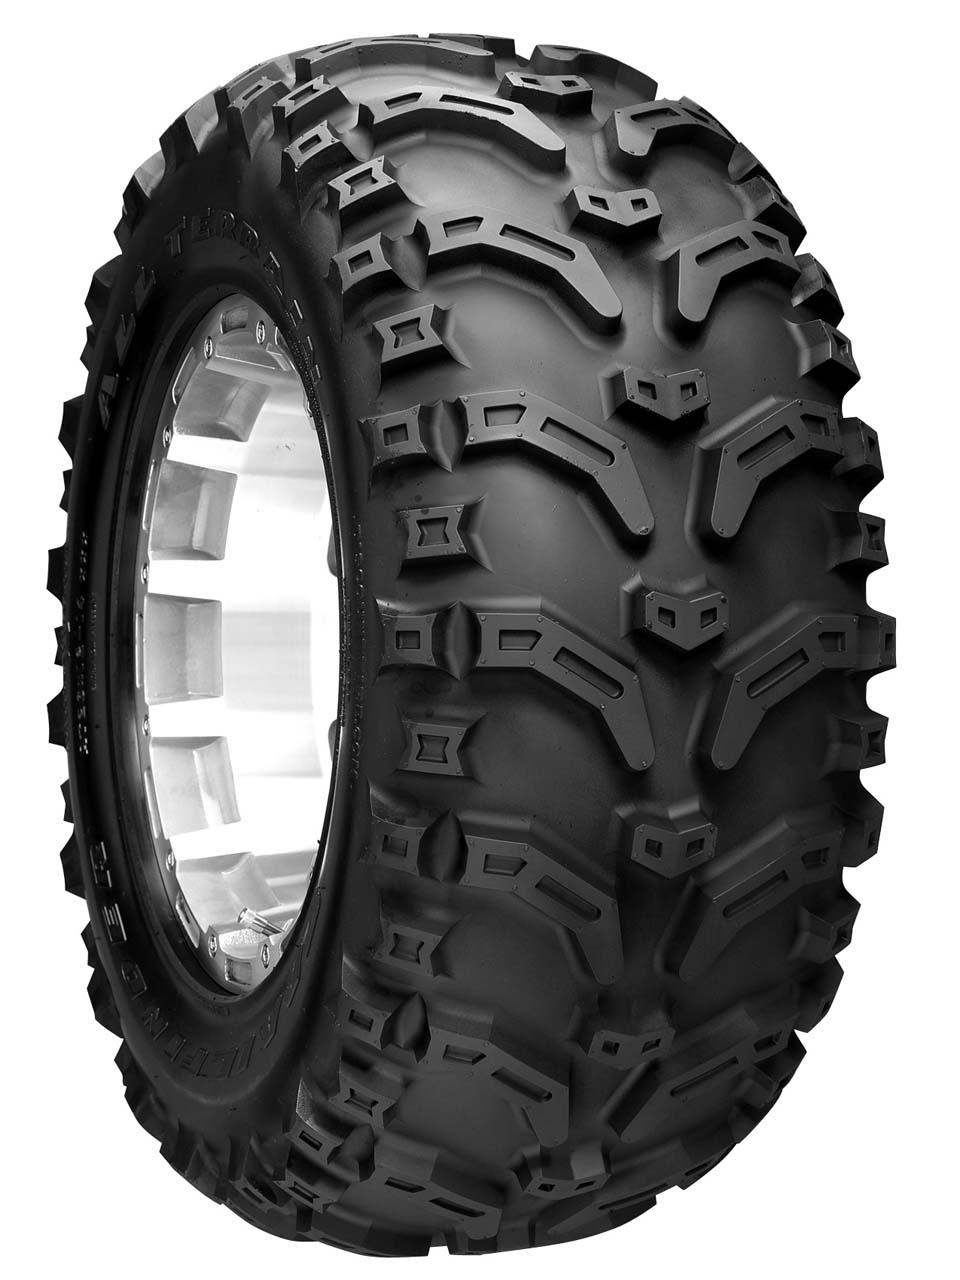 Atv tires atv illustrated trailfinder atv tire from discount tire direct buycottarizona